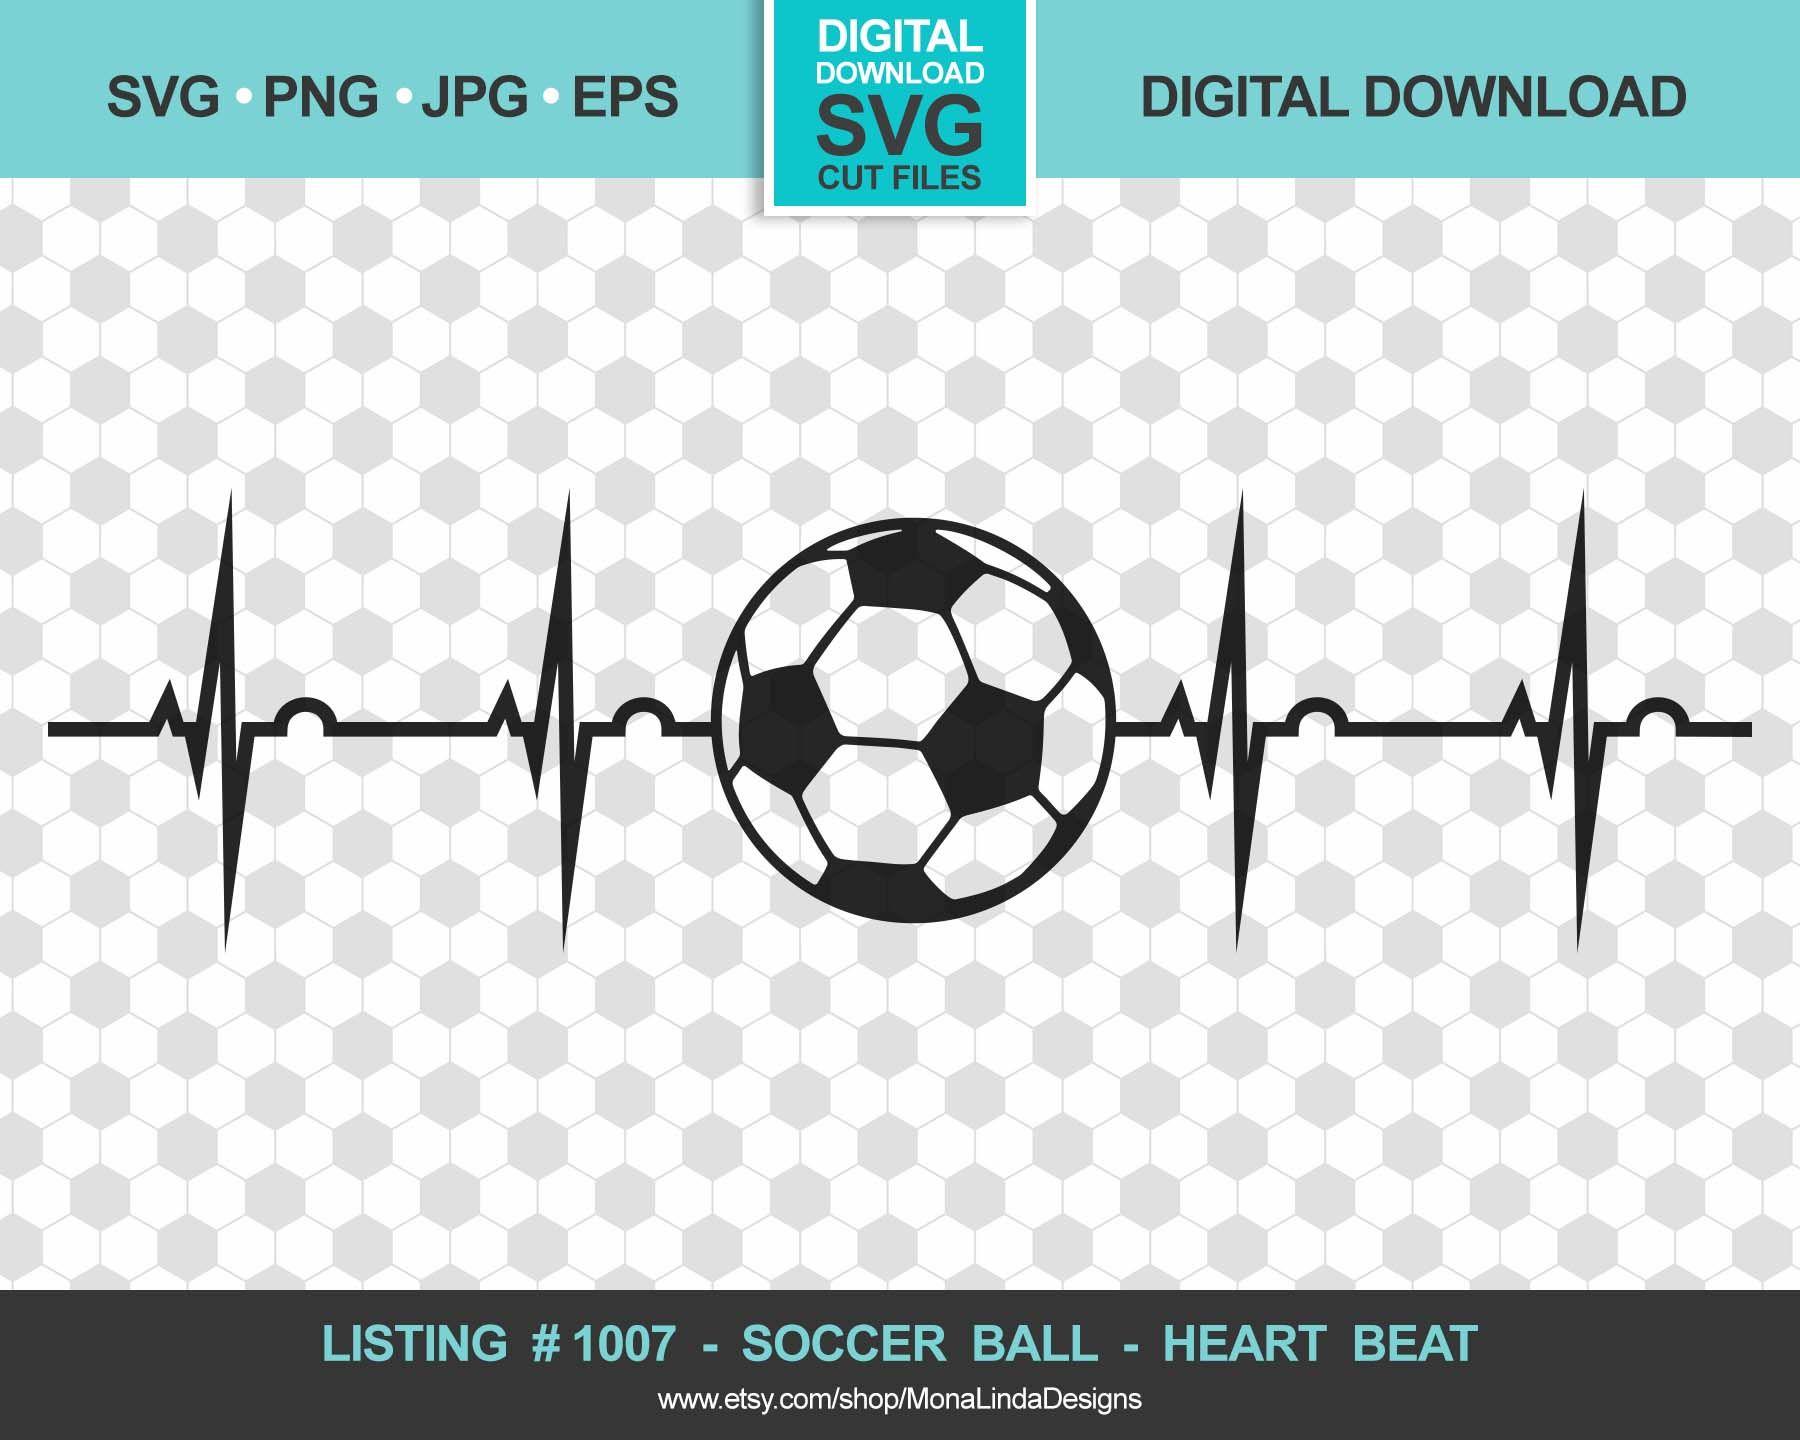 Soccer Ball Heart Beat Svg Svg Png Pdf Jpg Sports Etsy In 2020 Soccer Ball Soccer In A Heartbeat